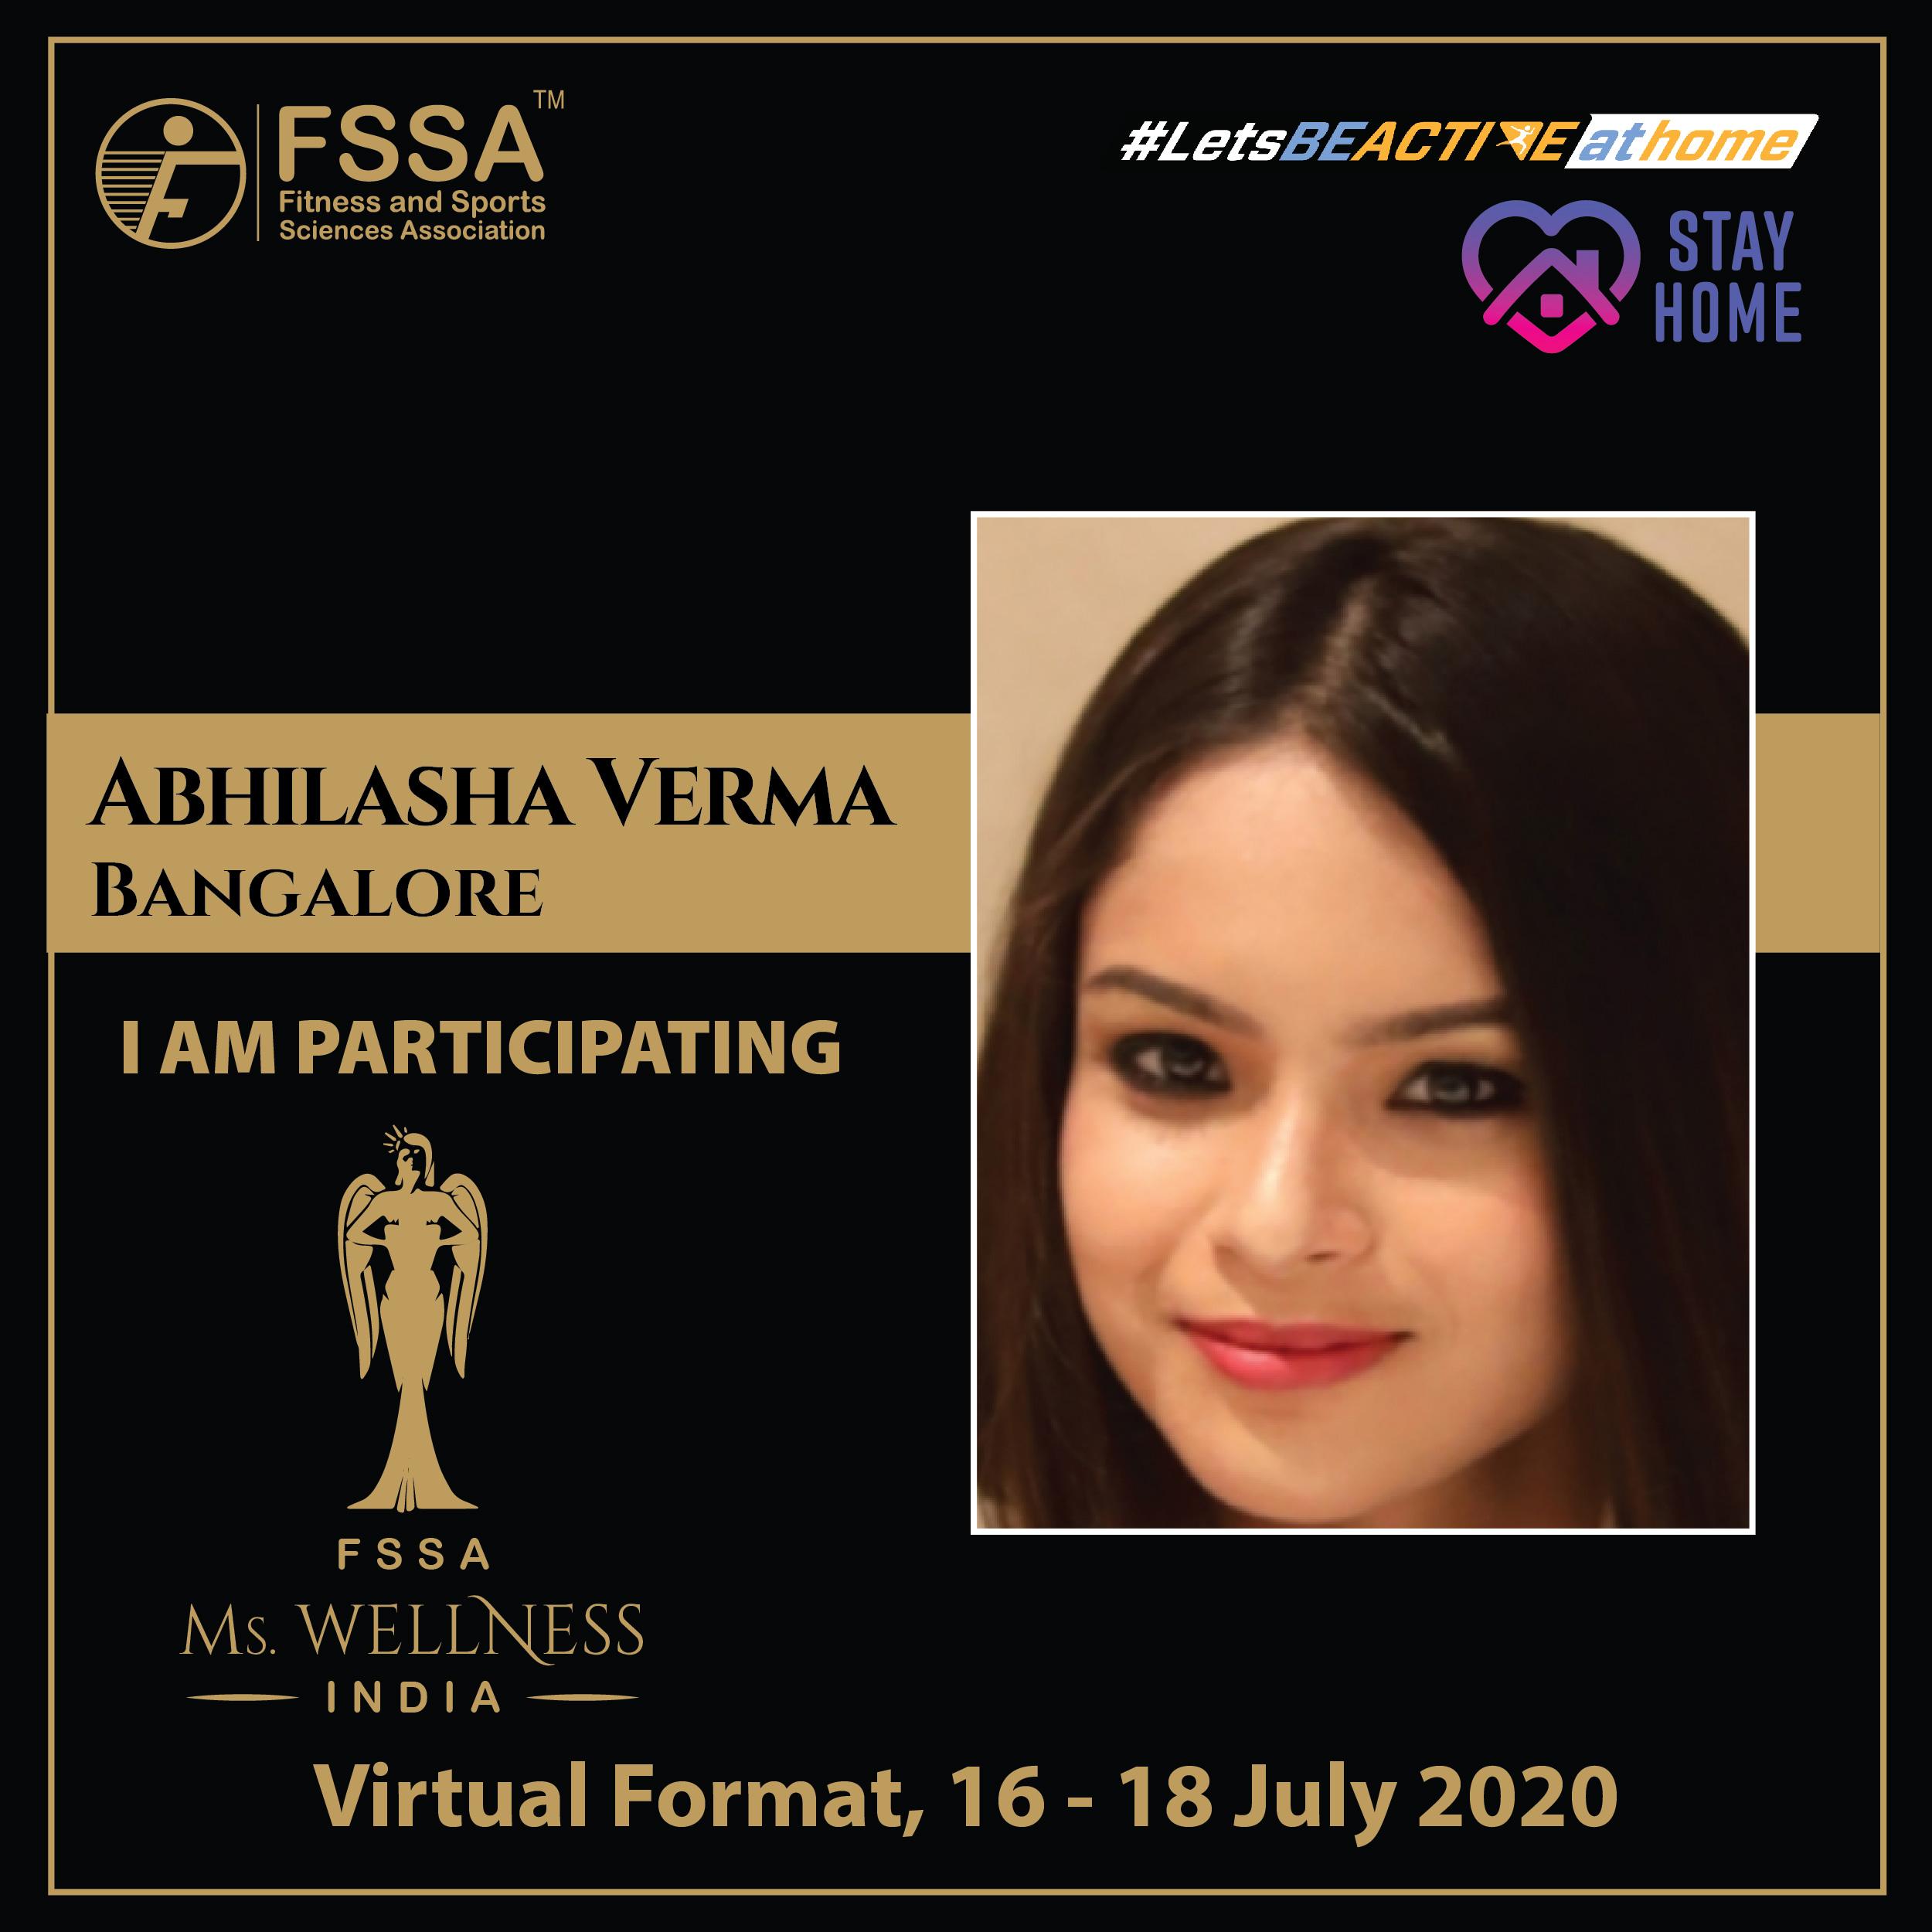 Abhilasha Verma - Bangalore